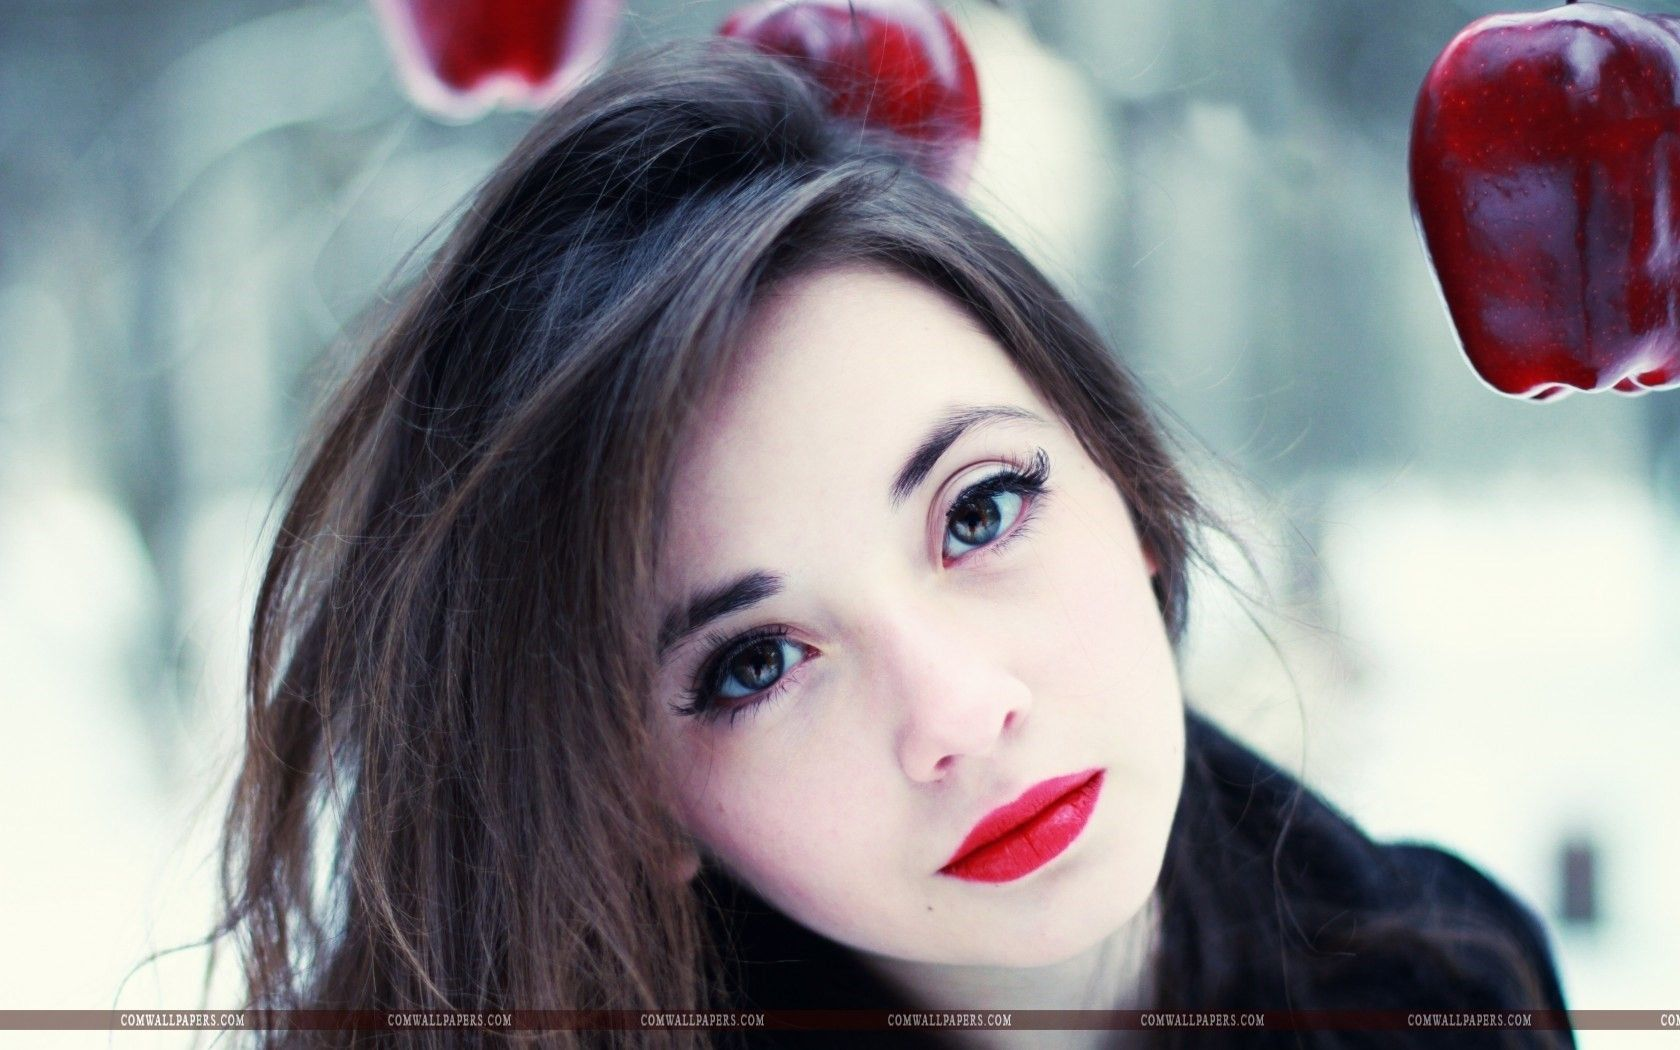 Girl Makeup Red Lips hd Wallpaper Girls HD Wallpapers